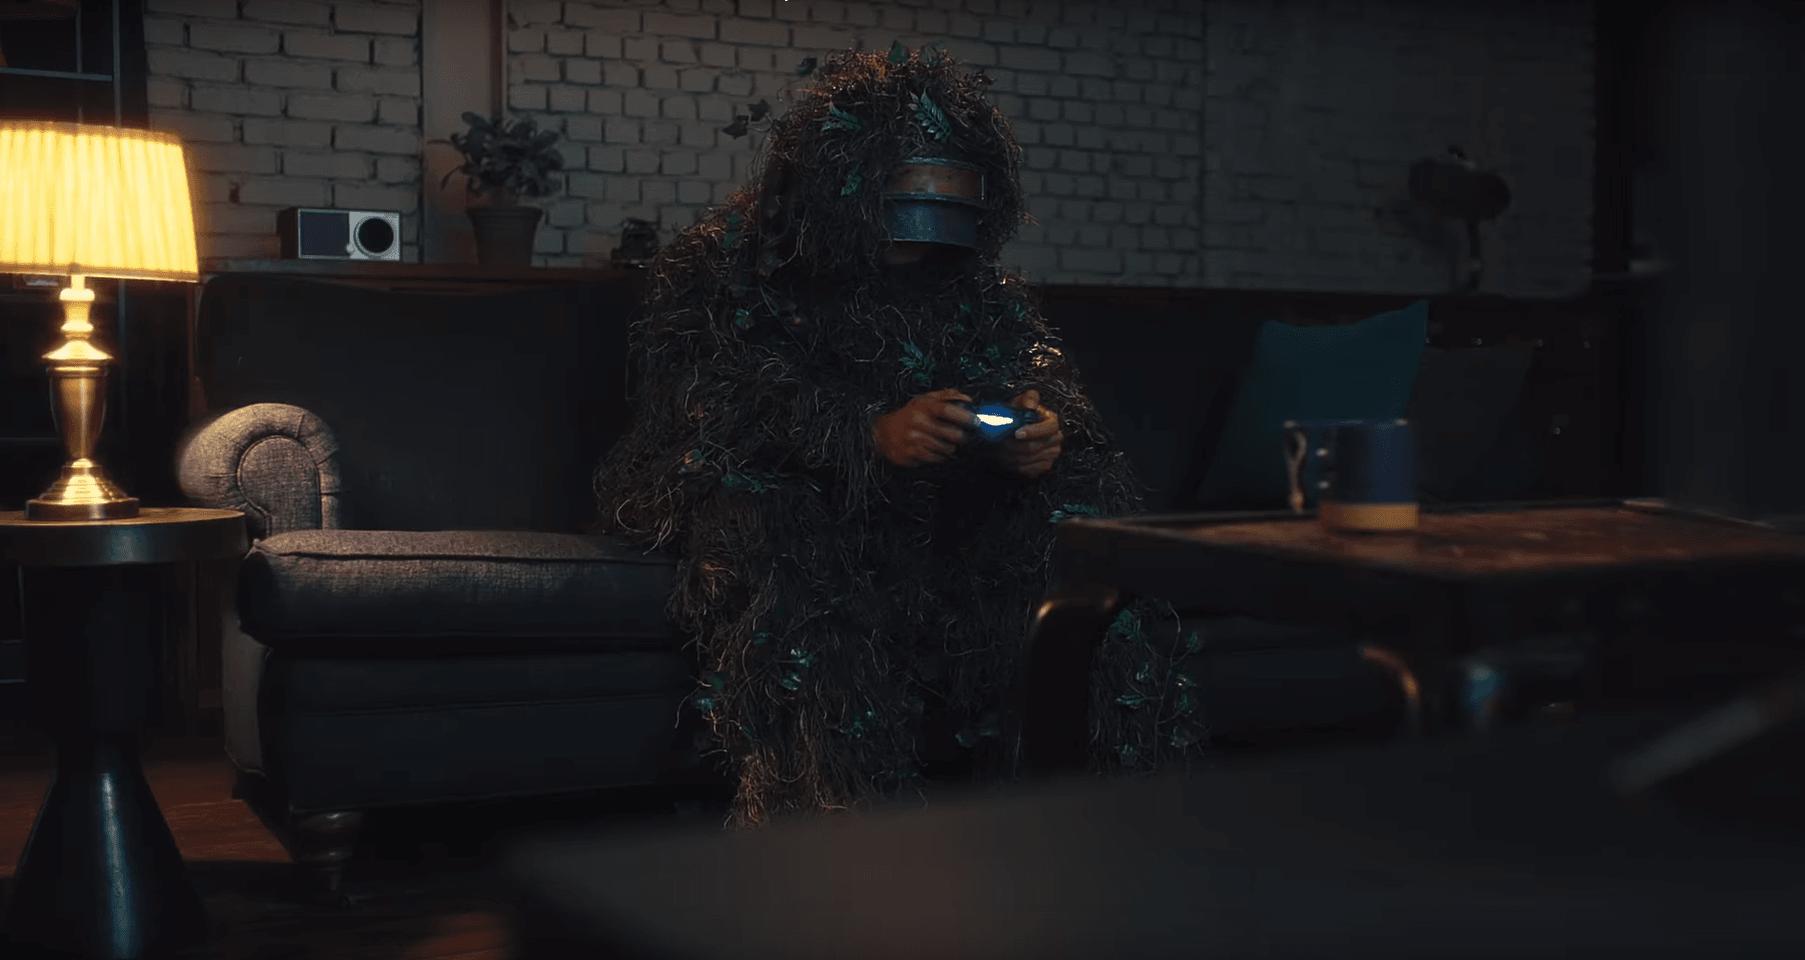 PUBG trafi na PS4 7 grudnia. Czy to aby jednak nie za późno? 21